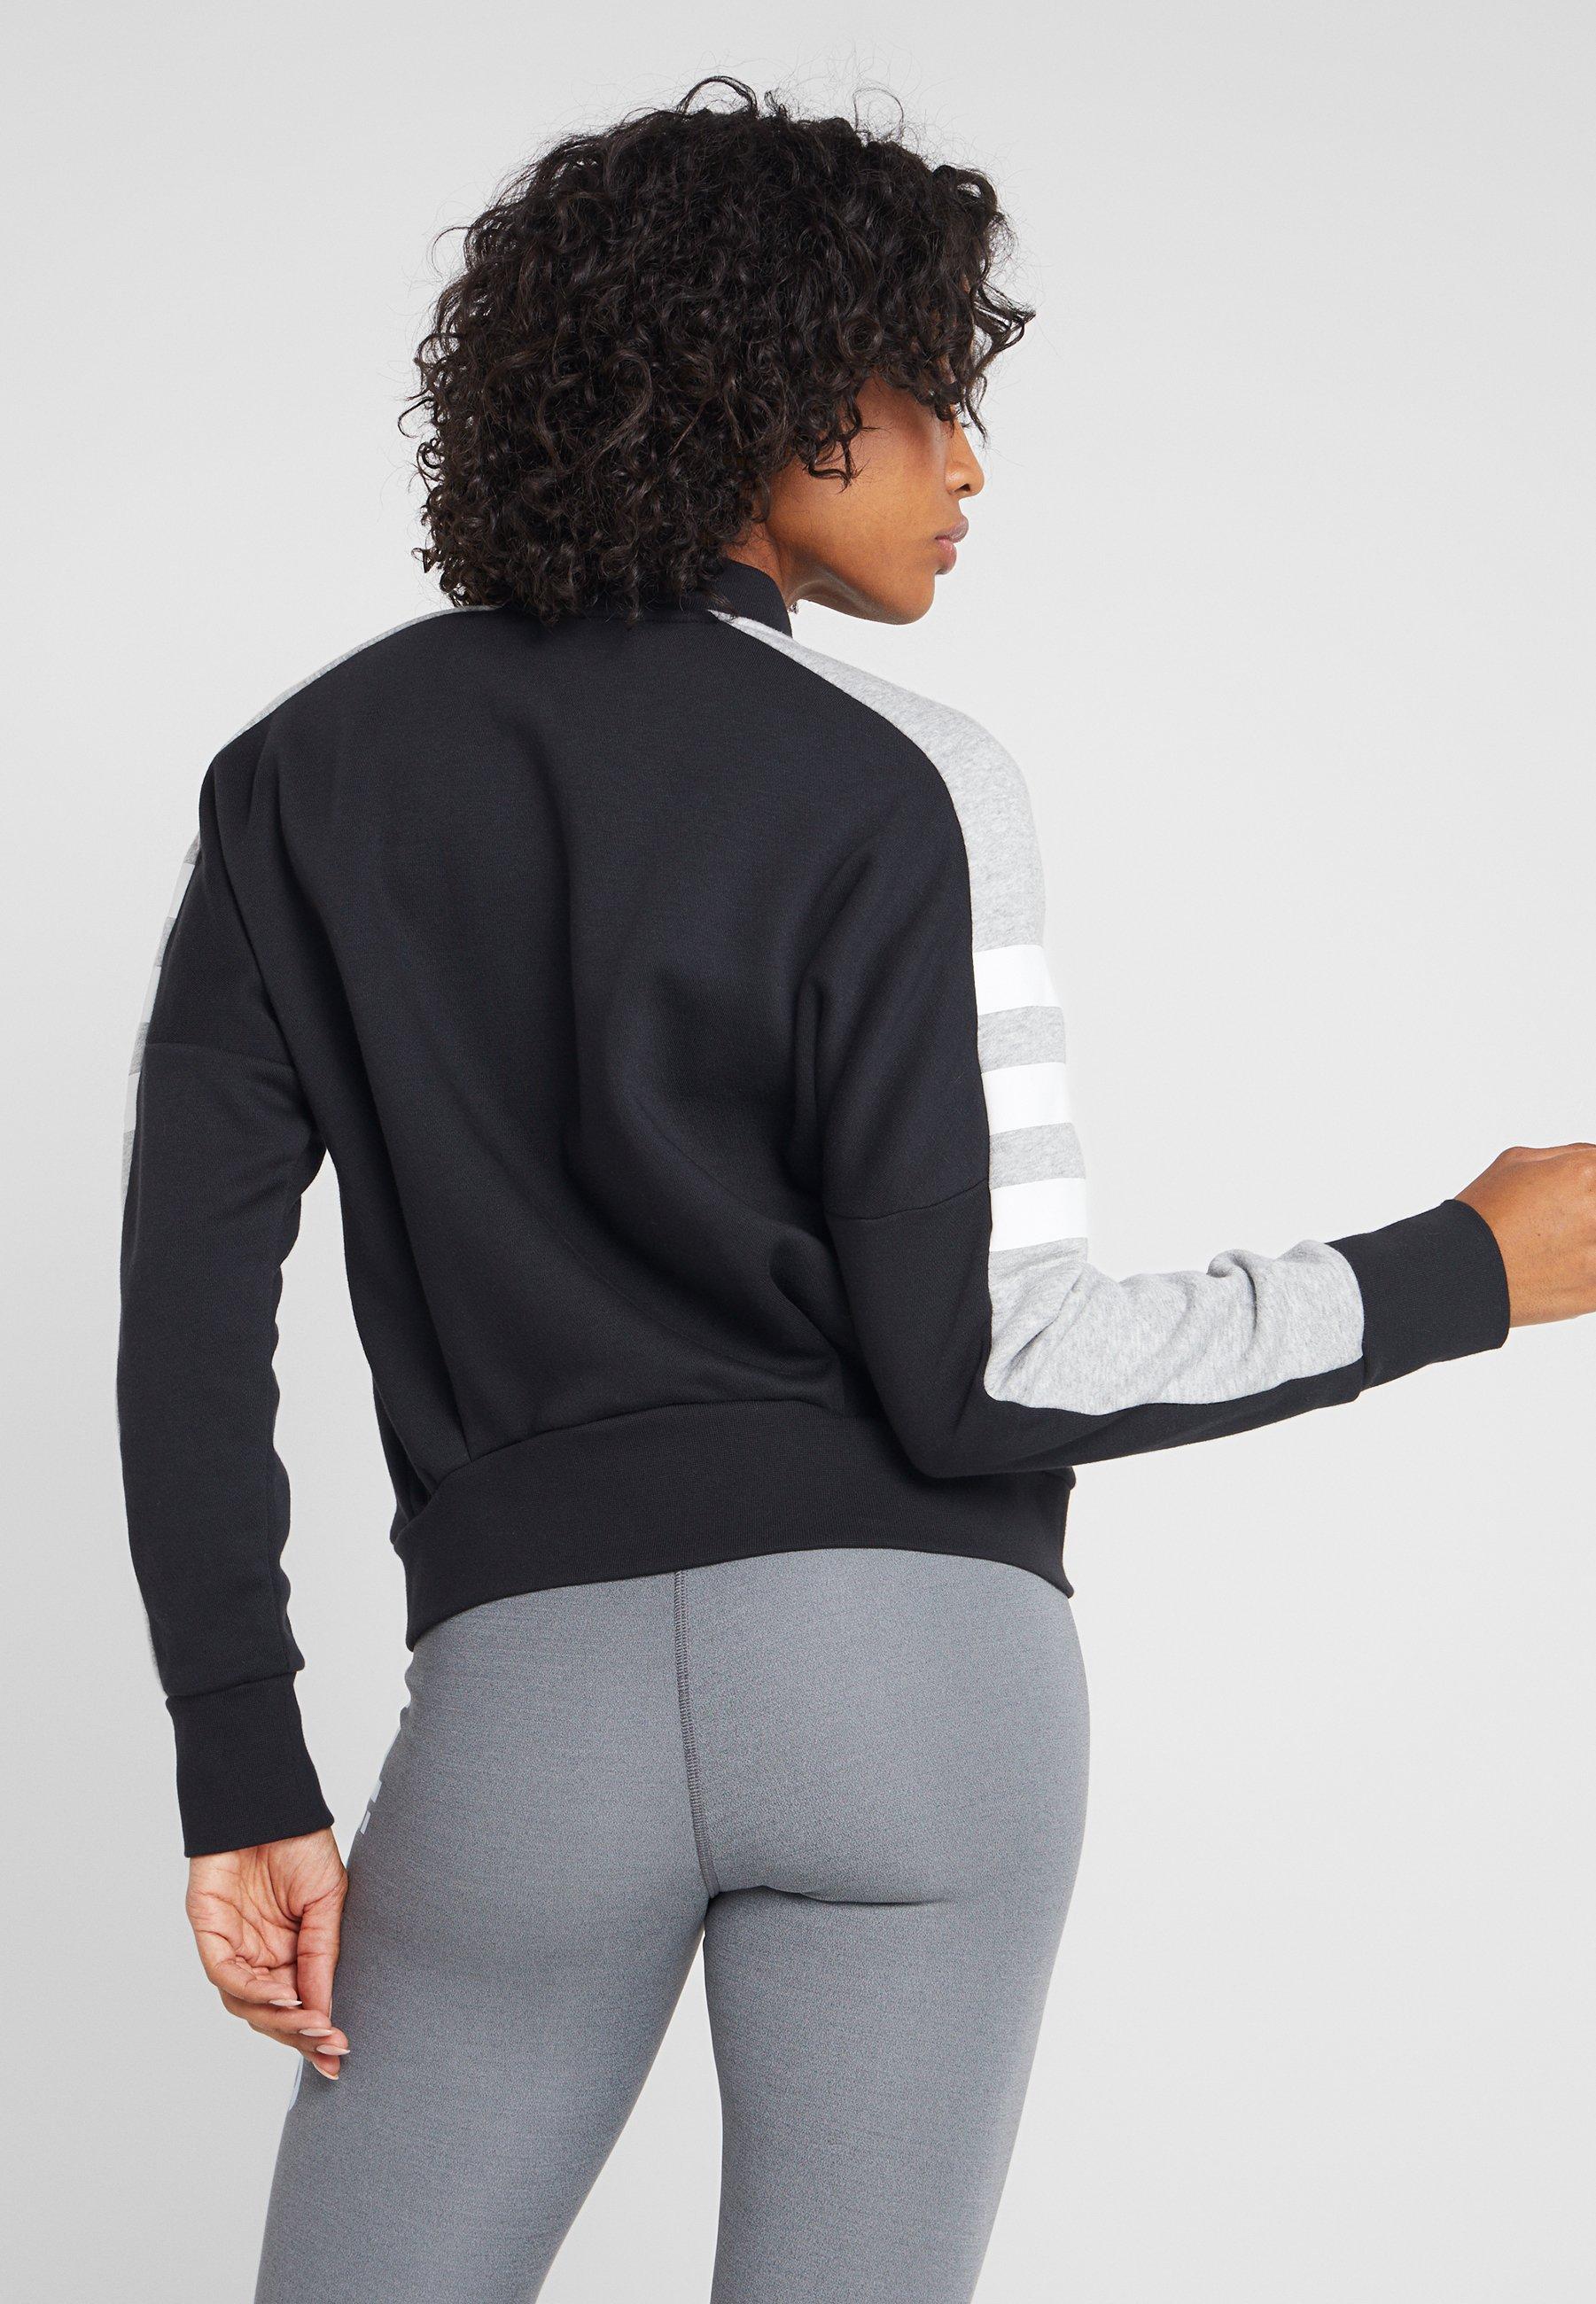 Adidas Black En medium Sid Grey Performance Heather Sweat Zippée JacketVeste L4Rqj53A